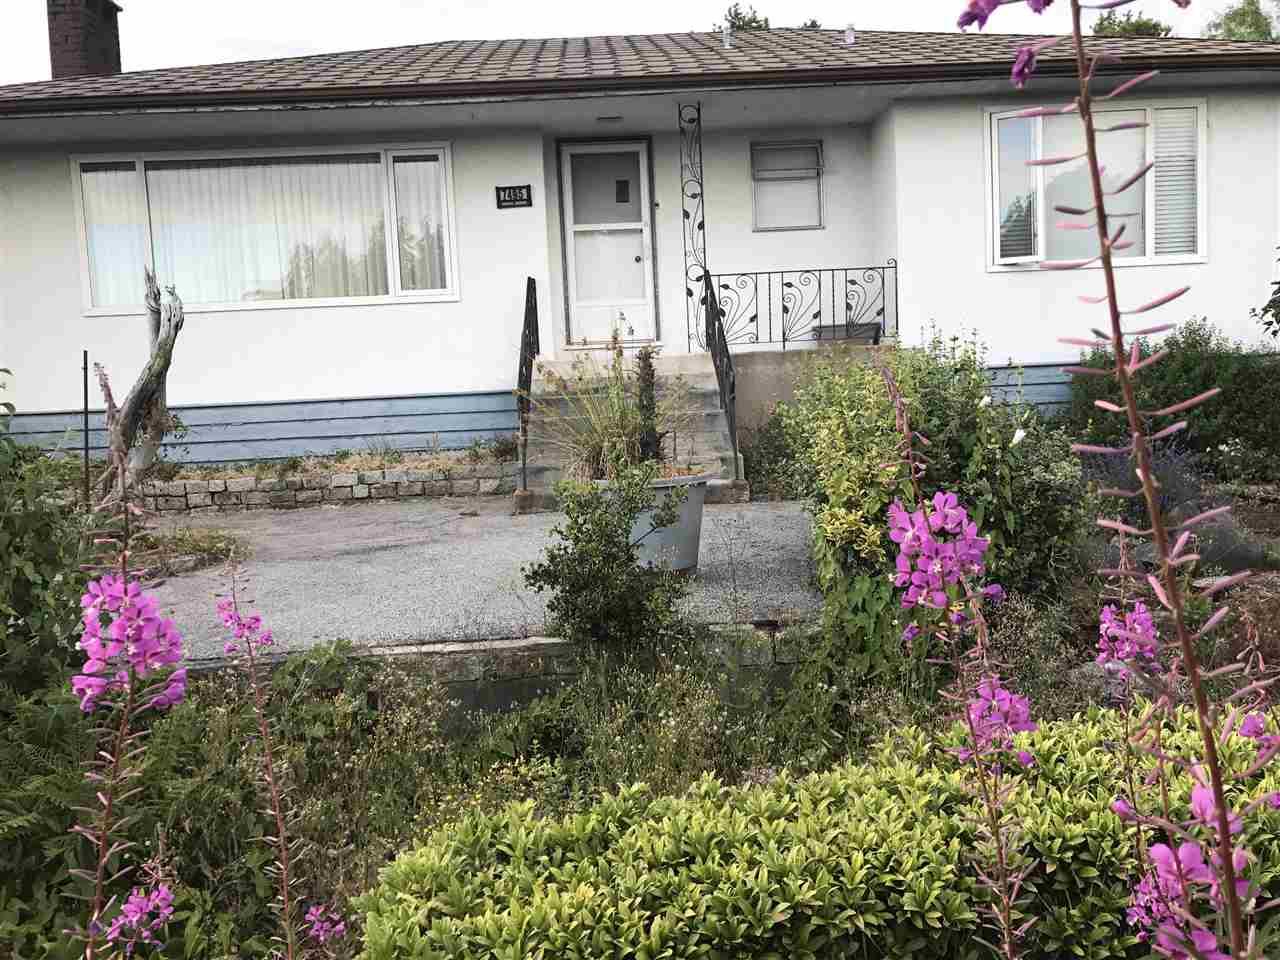 Detached at 7495 AUBREY STREET, Burnaby North, British Columbia. Image 1